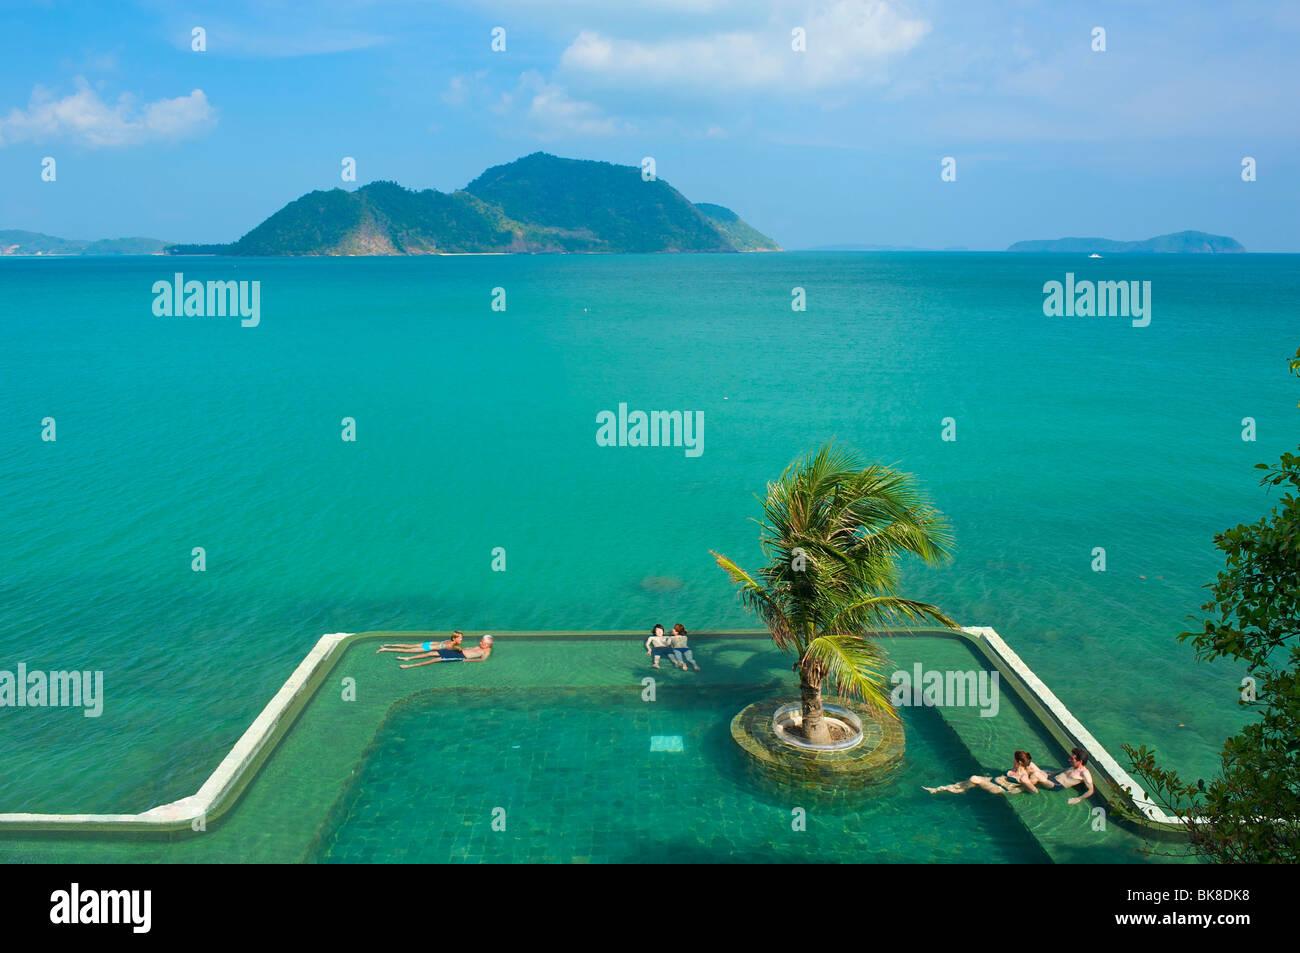 Pool, Evason Hotel, Insel Phuket, Thailand, Asien Stockbild